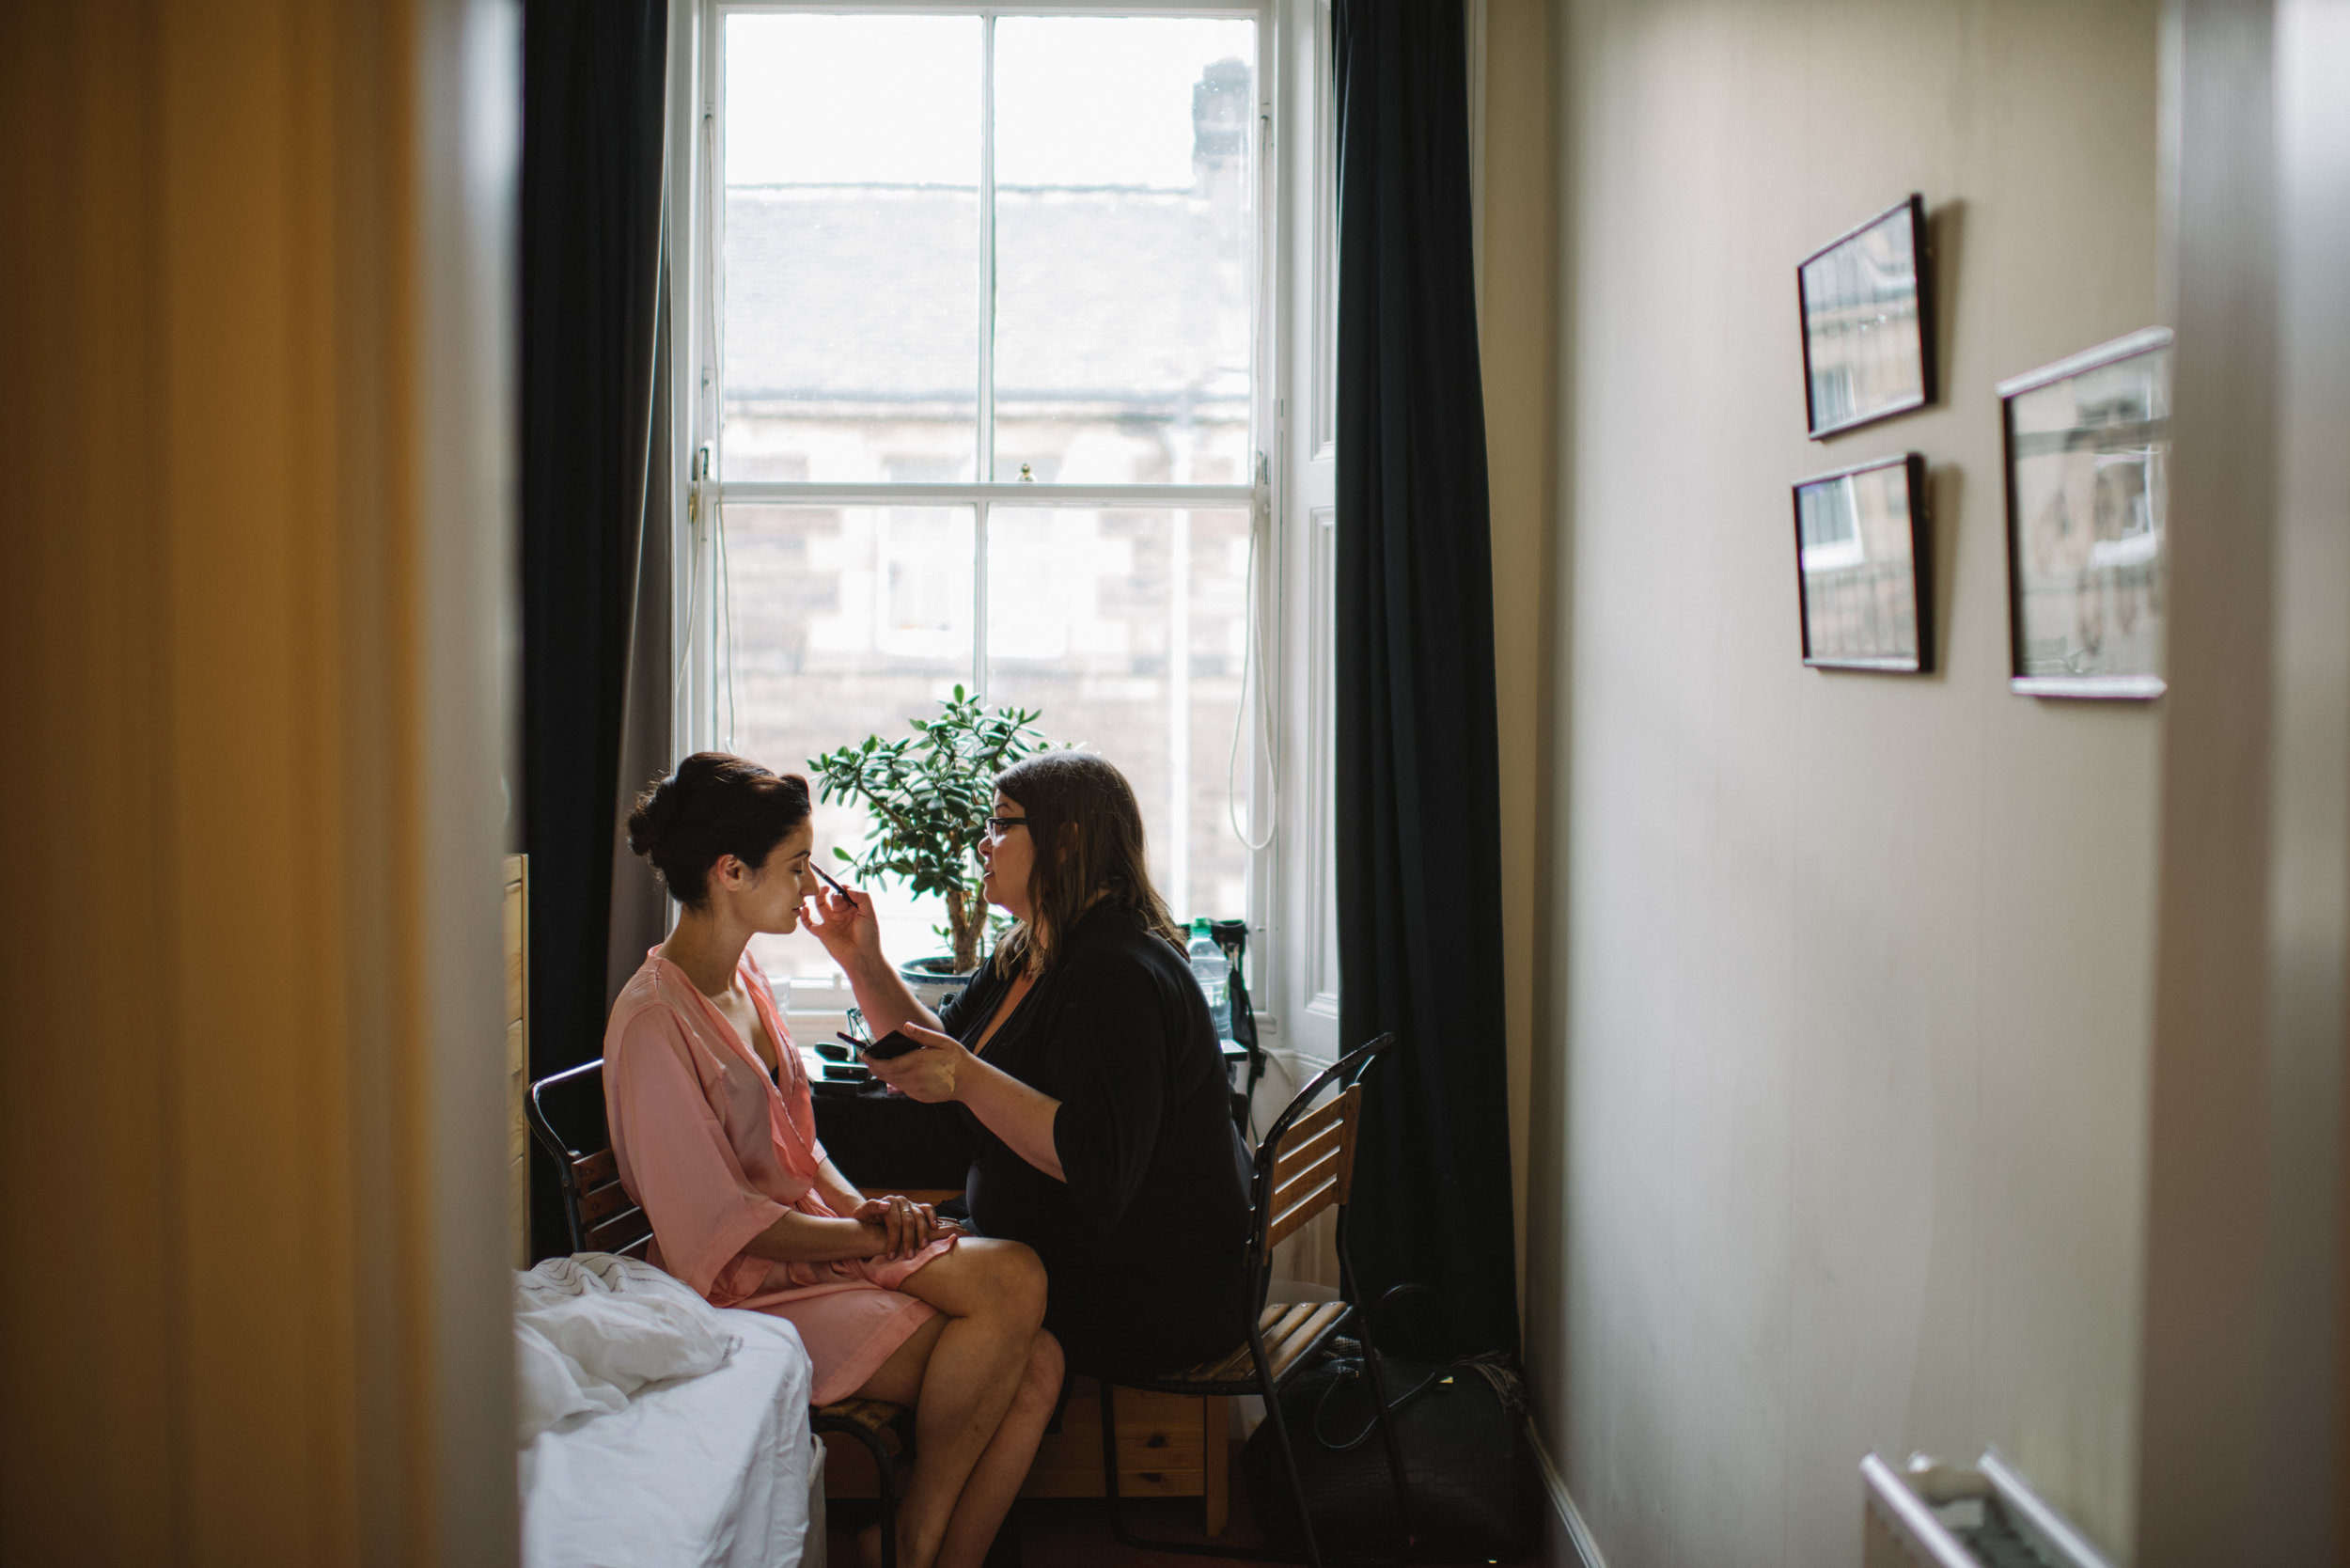 0068-LISA-DEVINE-PHOTOGRAPHY-ALTERNATIVE-WEDDING-PHOTOGRAPHY-SCOTLAND-DESTINATION-WEDDINGS-GLASGOW-WEDDINGS-COOL-WEDDINGS-STYLISH-WEDDINGS.JPG